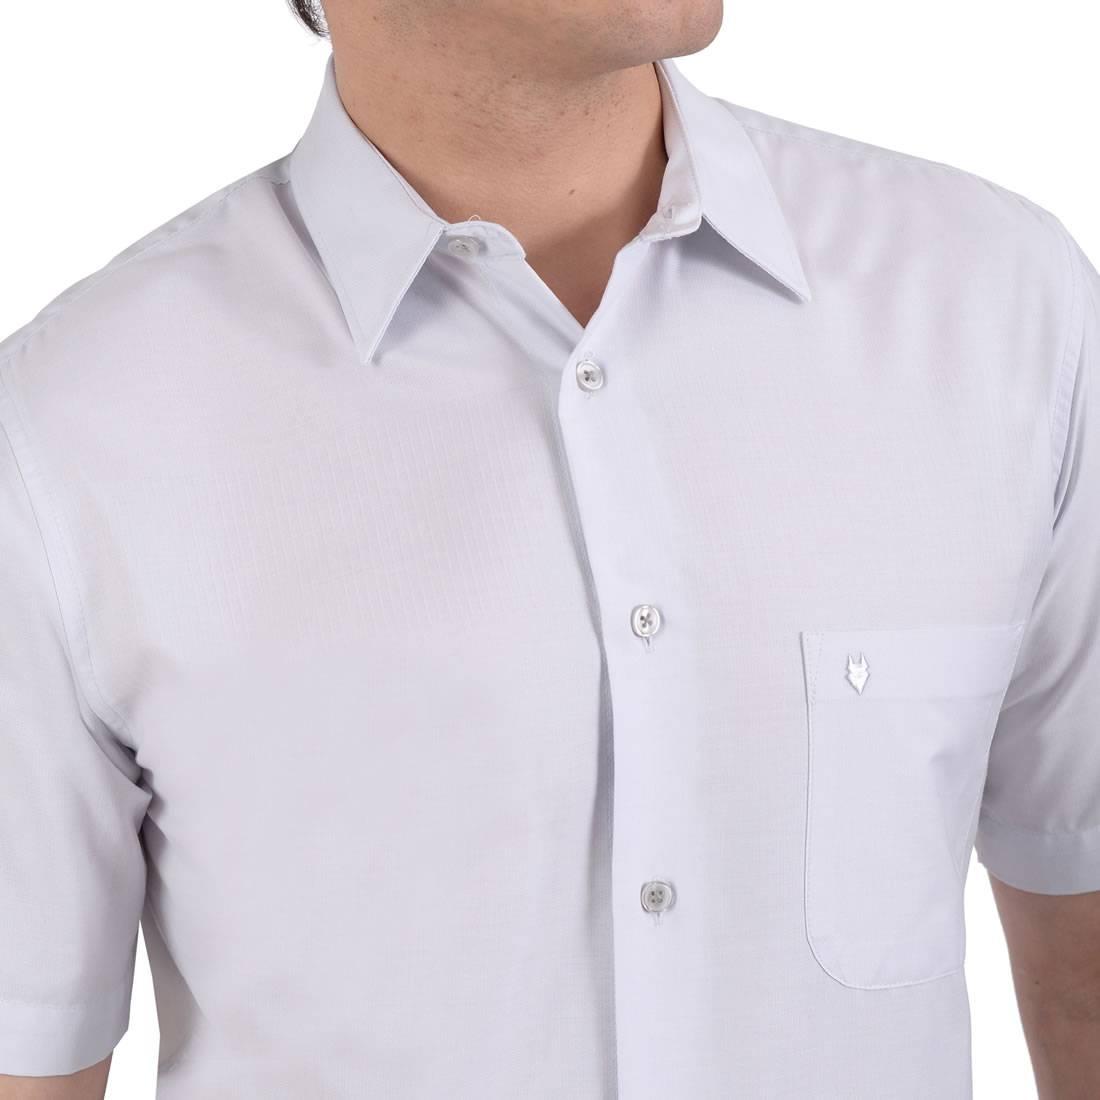 042379432106-04-Camisa-Casual-Manga-Corta-Classic-Fit-Gris-yale